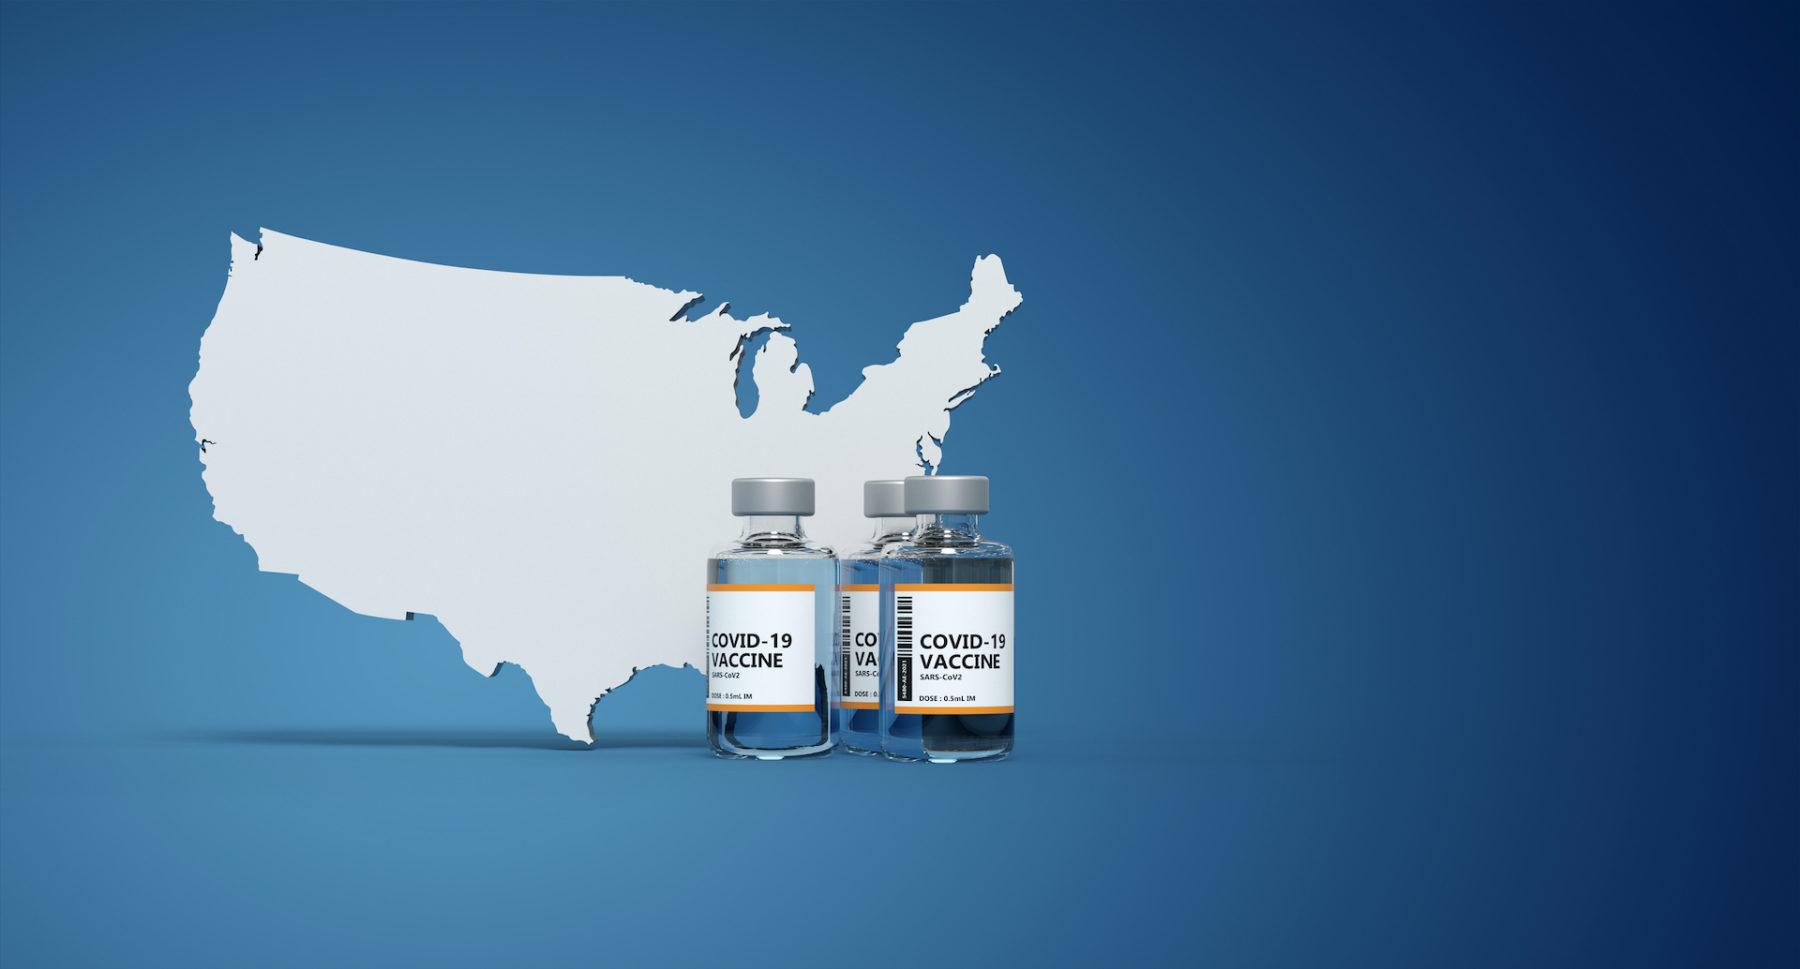 Covid-19 Vaccine bottle - 3D rendering